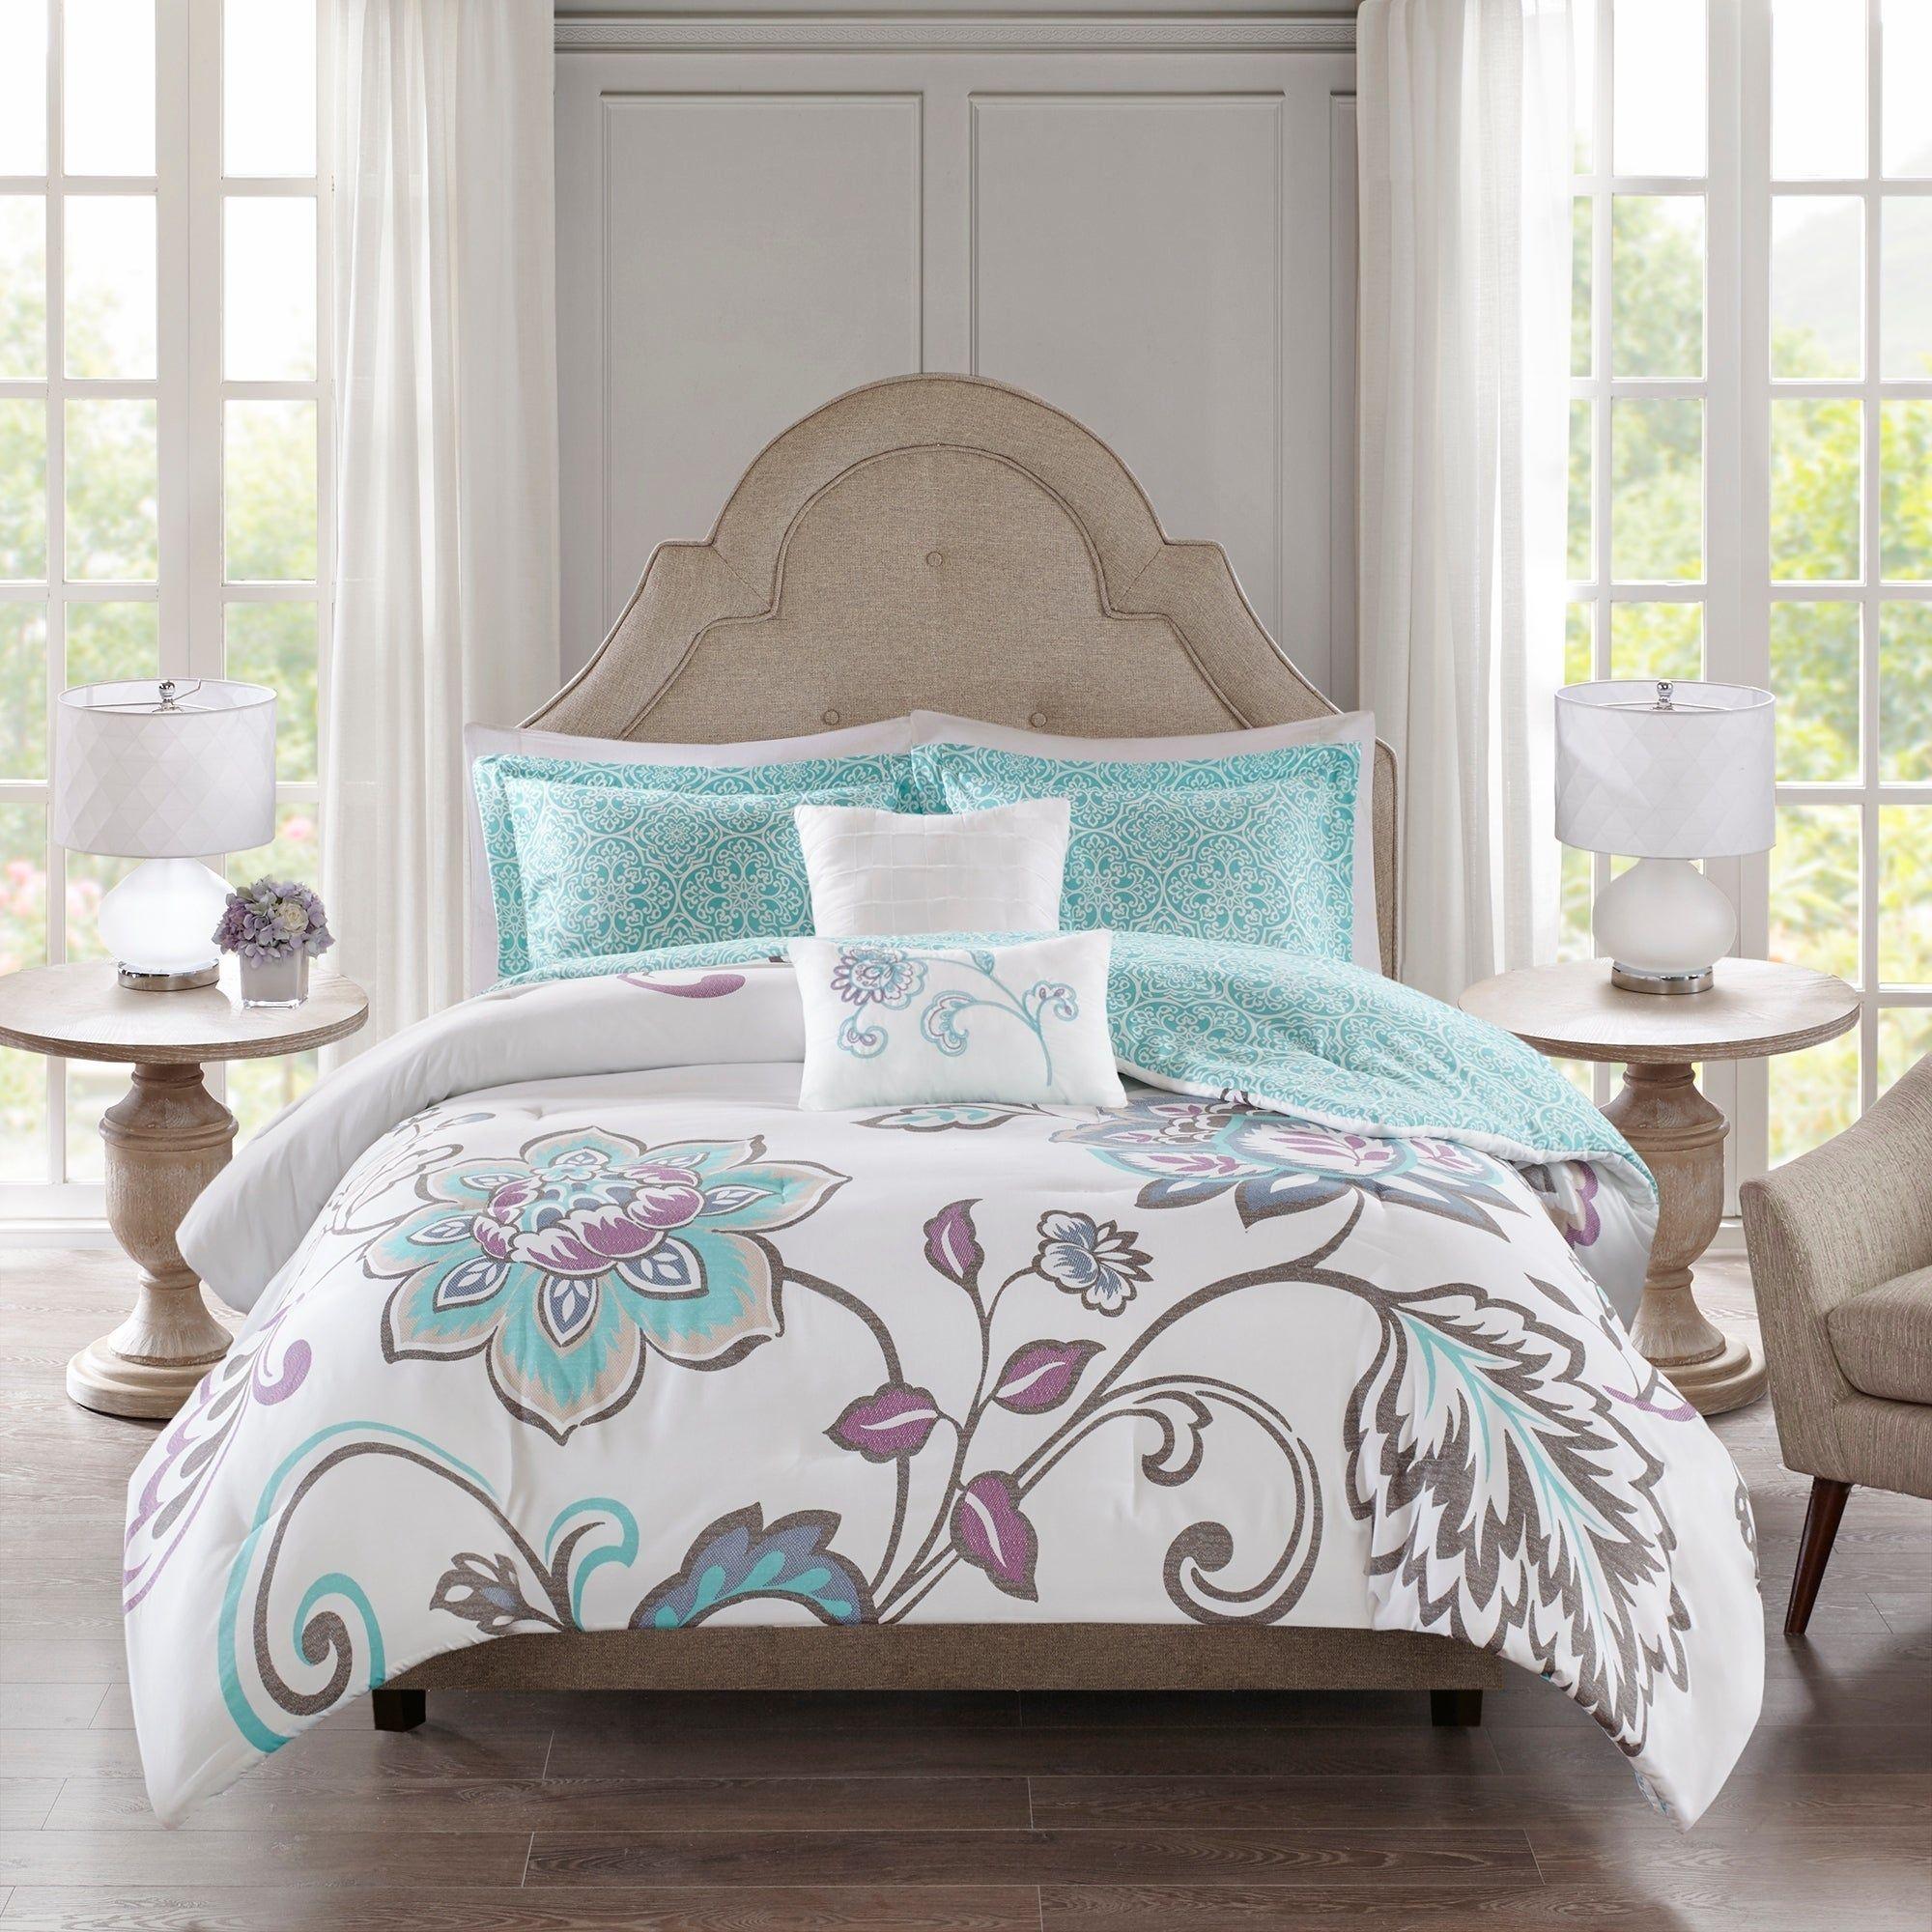 510 Design Gratia Aqua 5 Piece Full Queen Size Reversible Print Comforter Set As Is Item Comforter Sets Online Bedding Stores Affordable Bedding